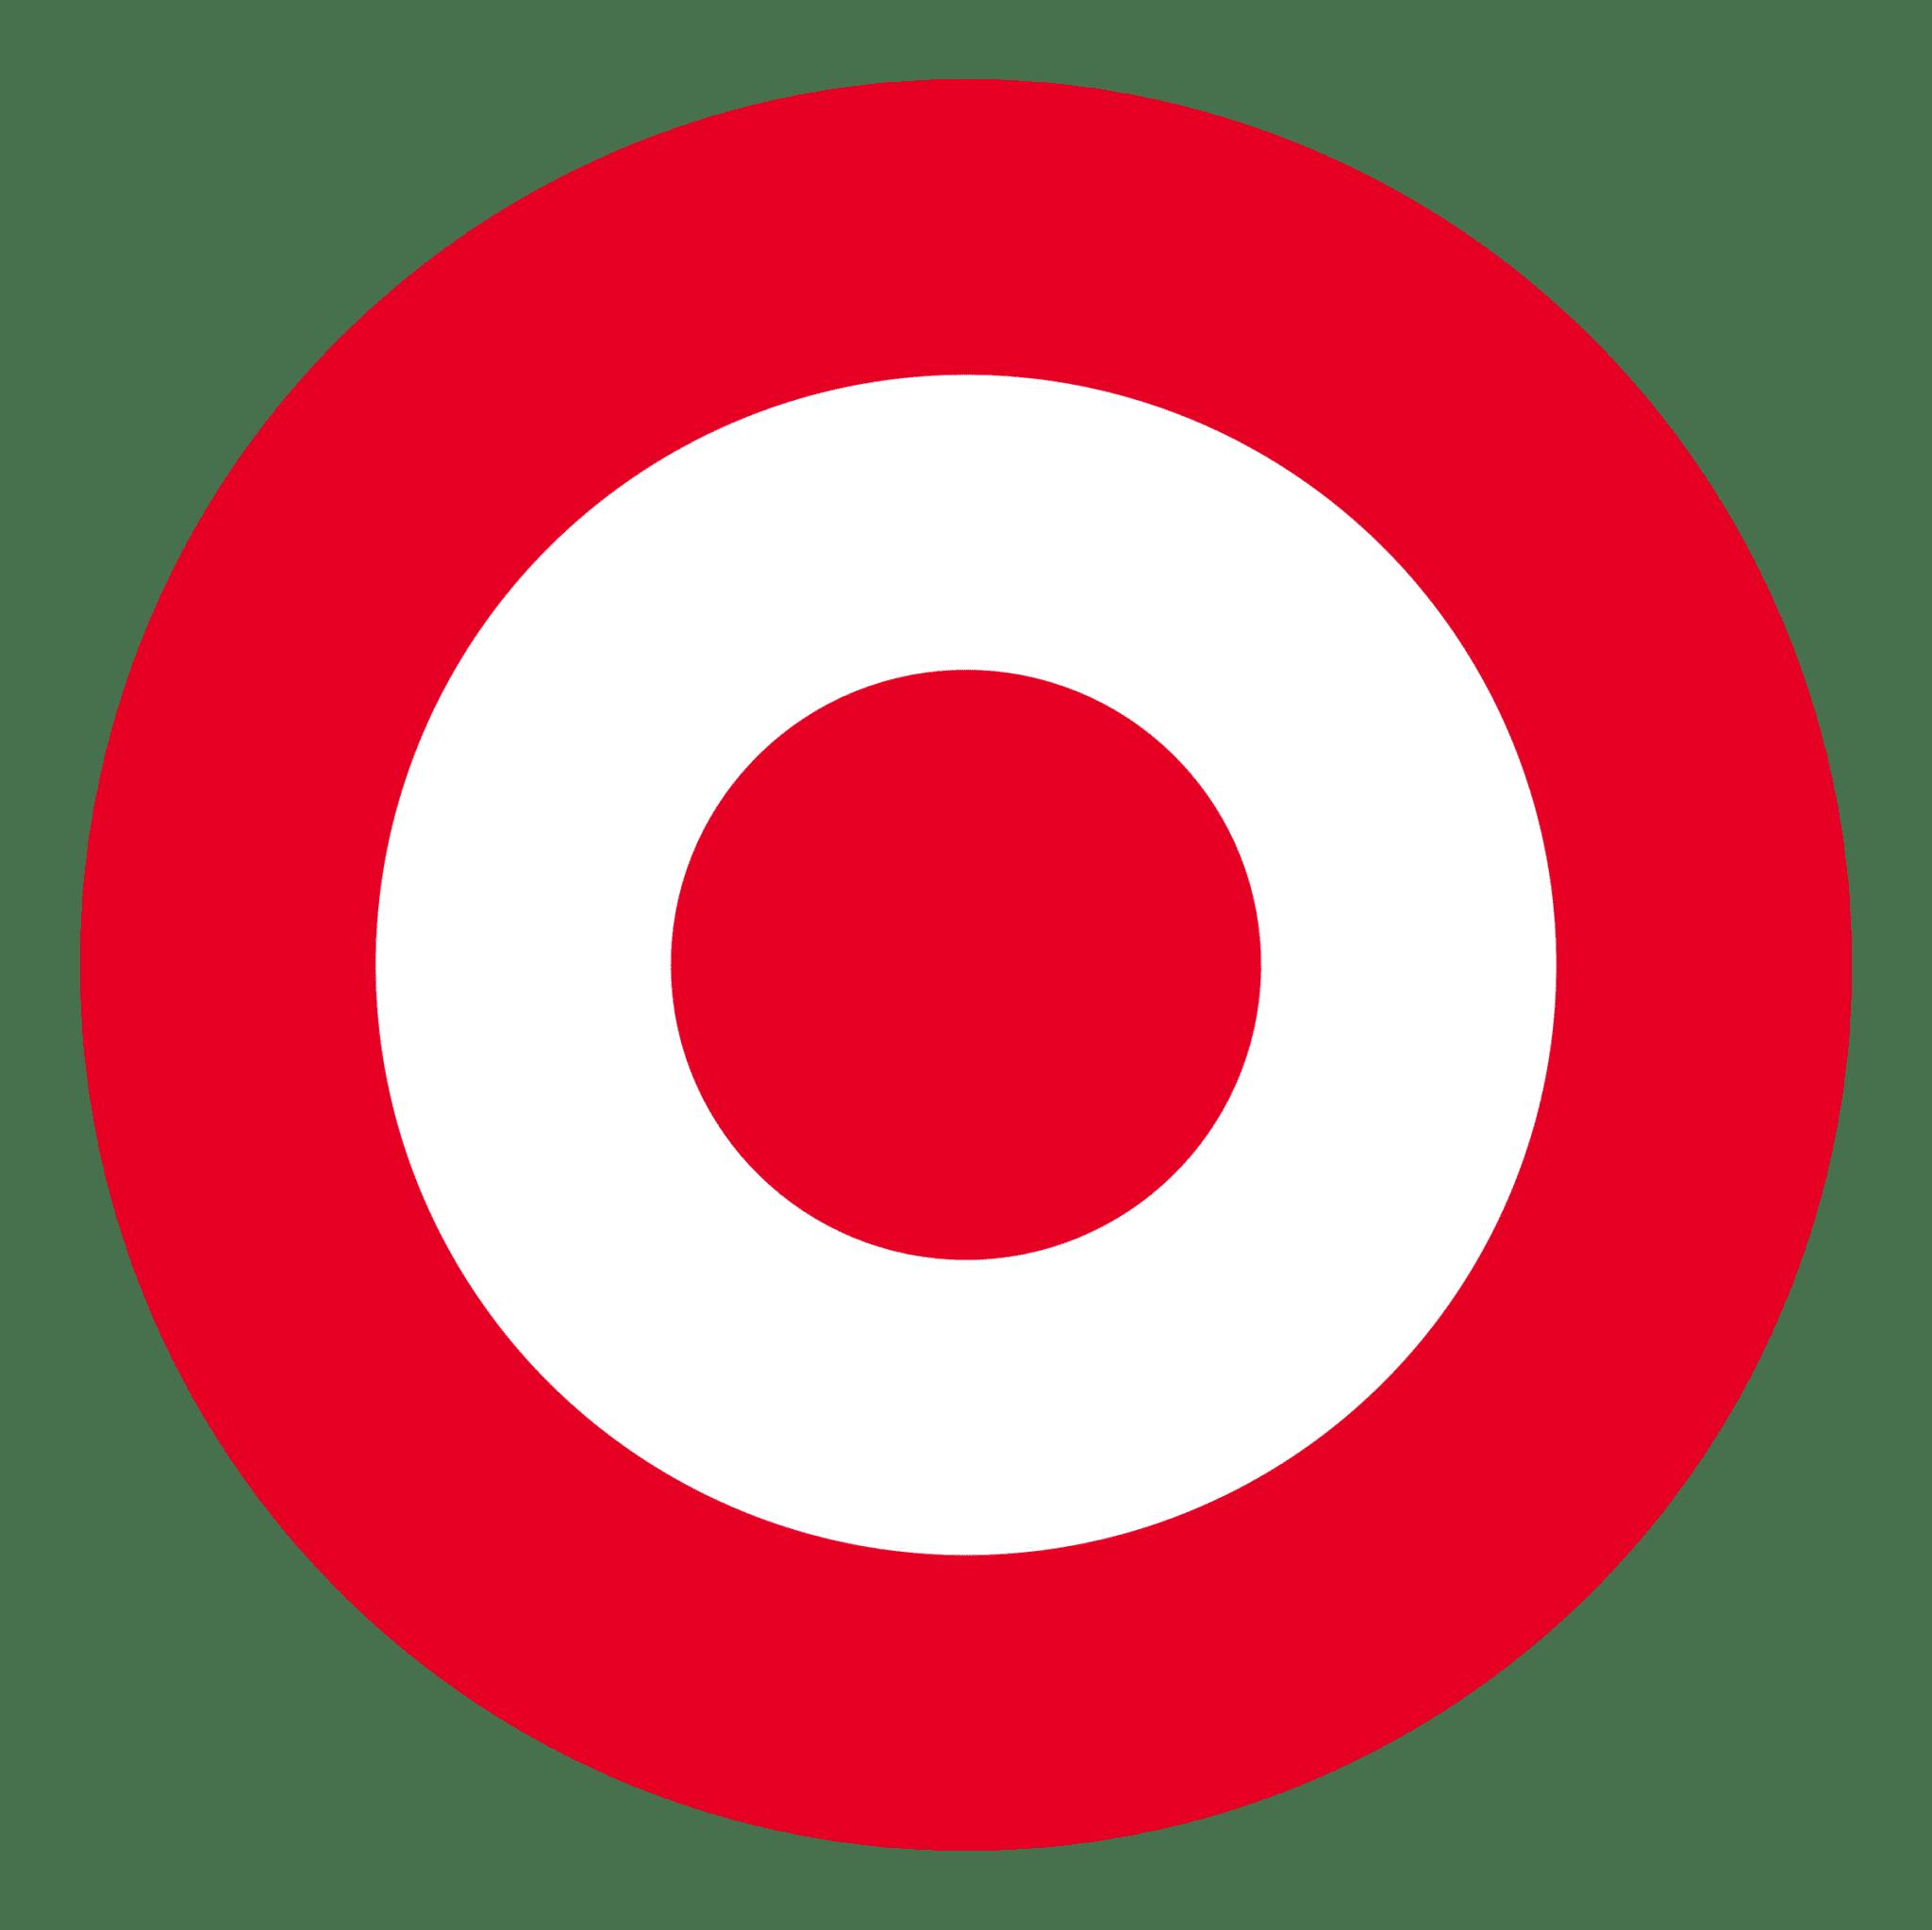 target-logo-transparent - Colorado Rapids Youth Soccer Club